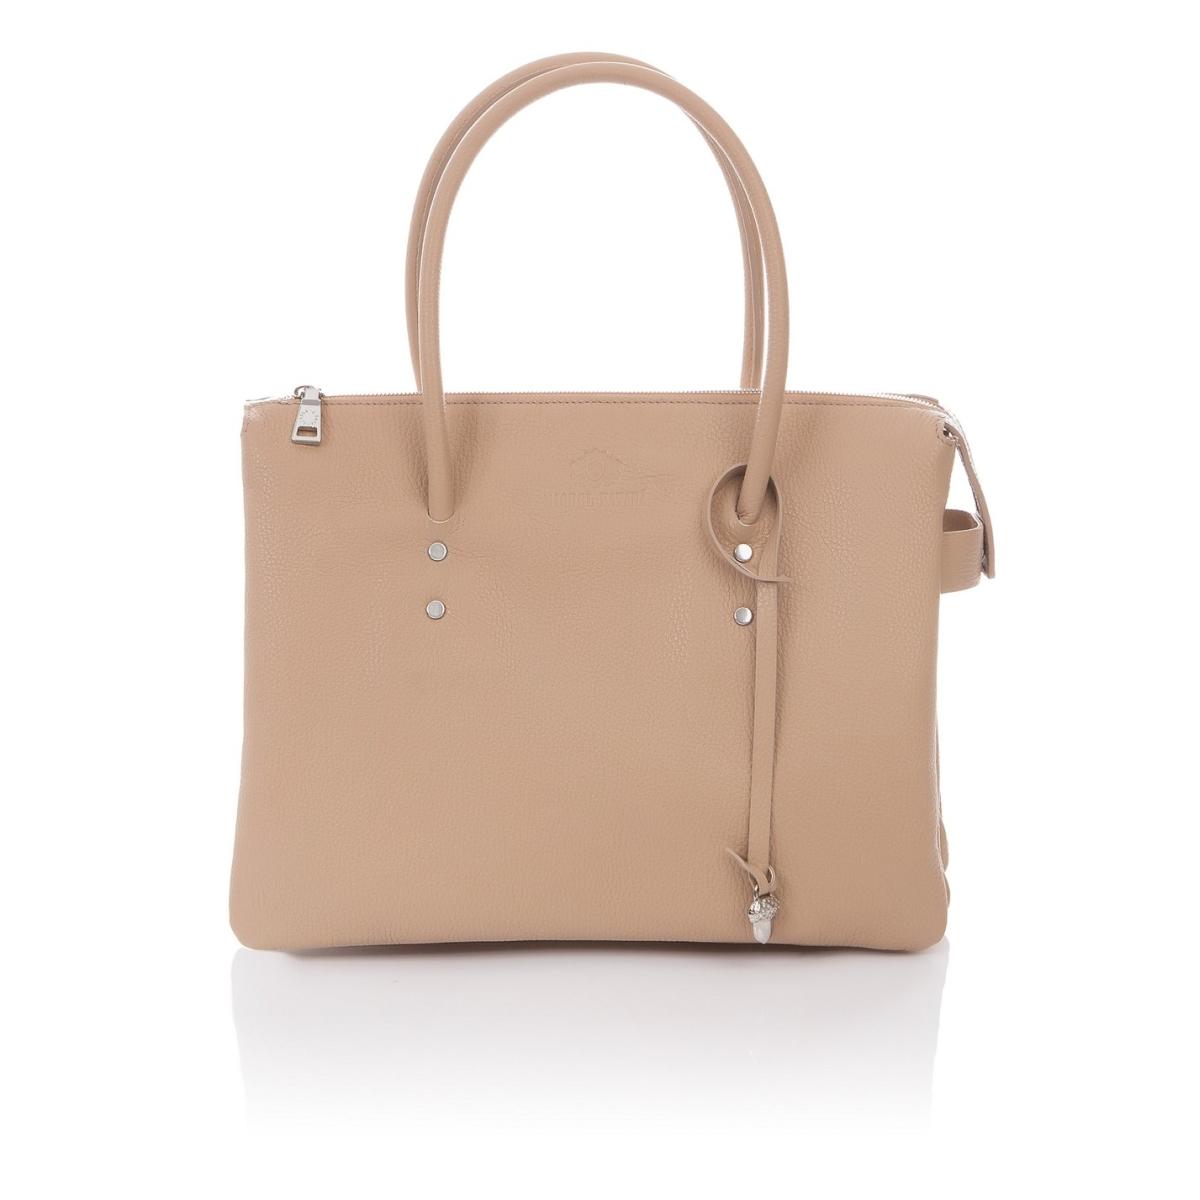 3252e1b0804a Женская сумка Michel Katana 7895V0200.Miro/CANNELLA, в наличии ...